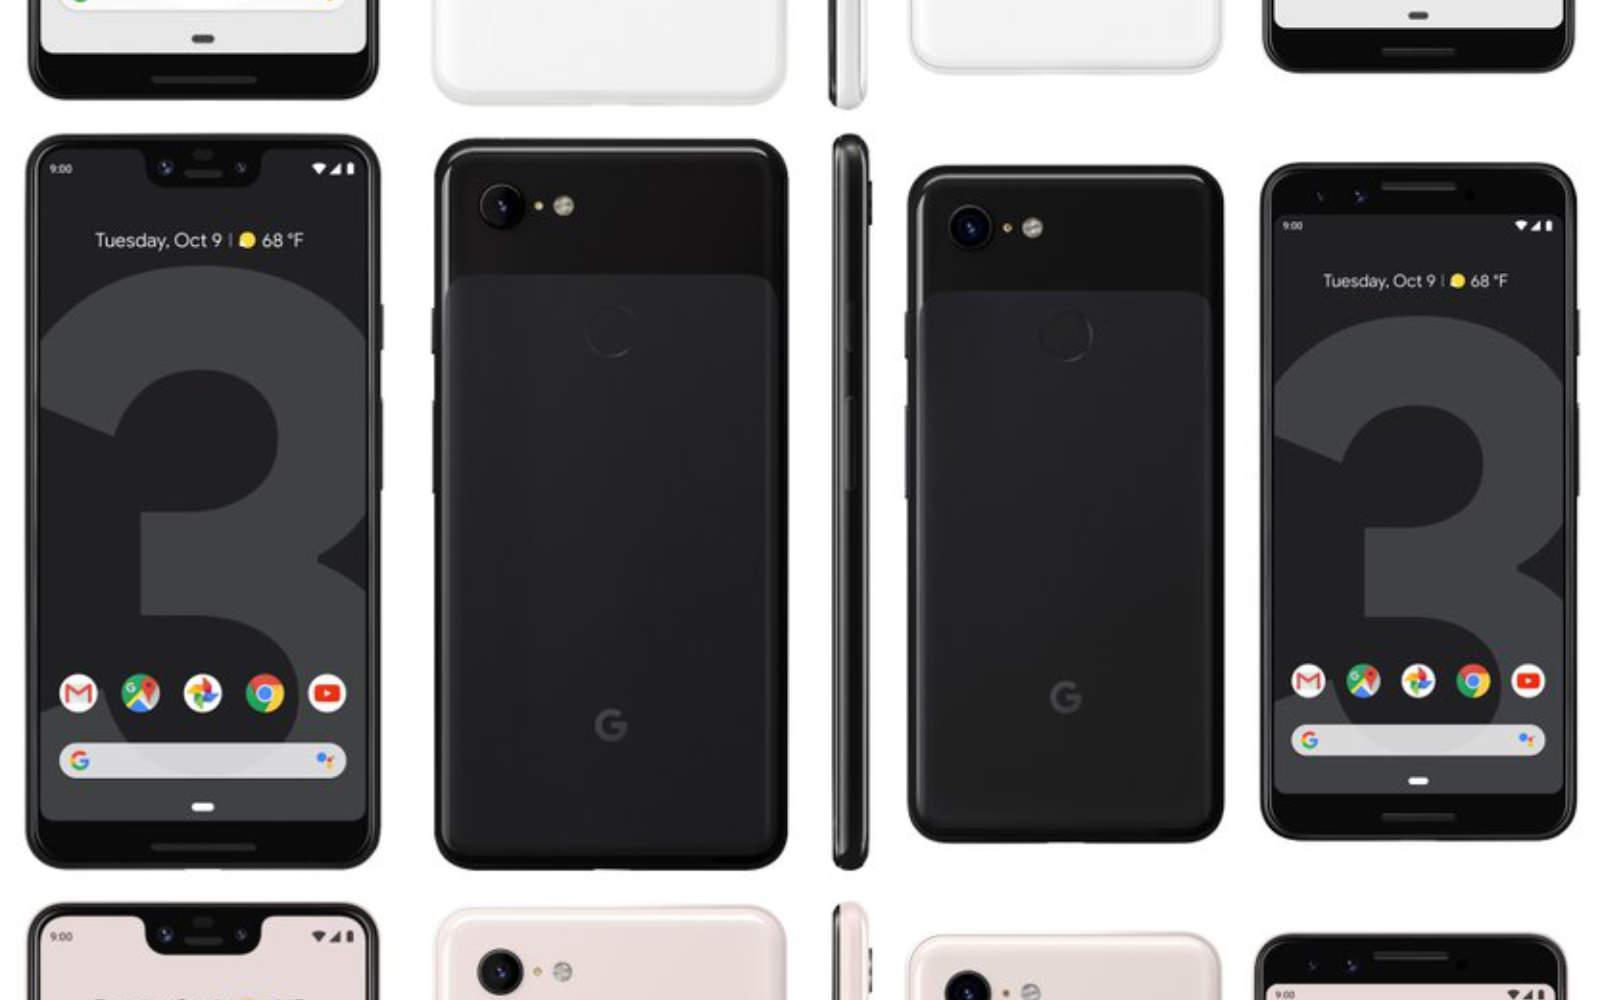 pixel-3-images.jpg